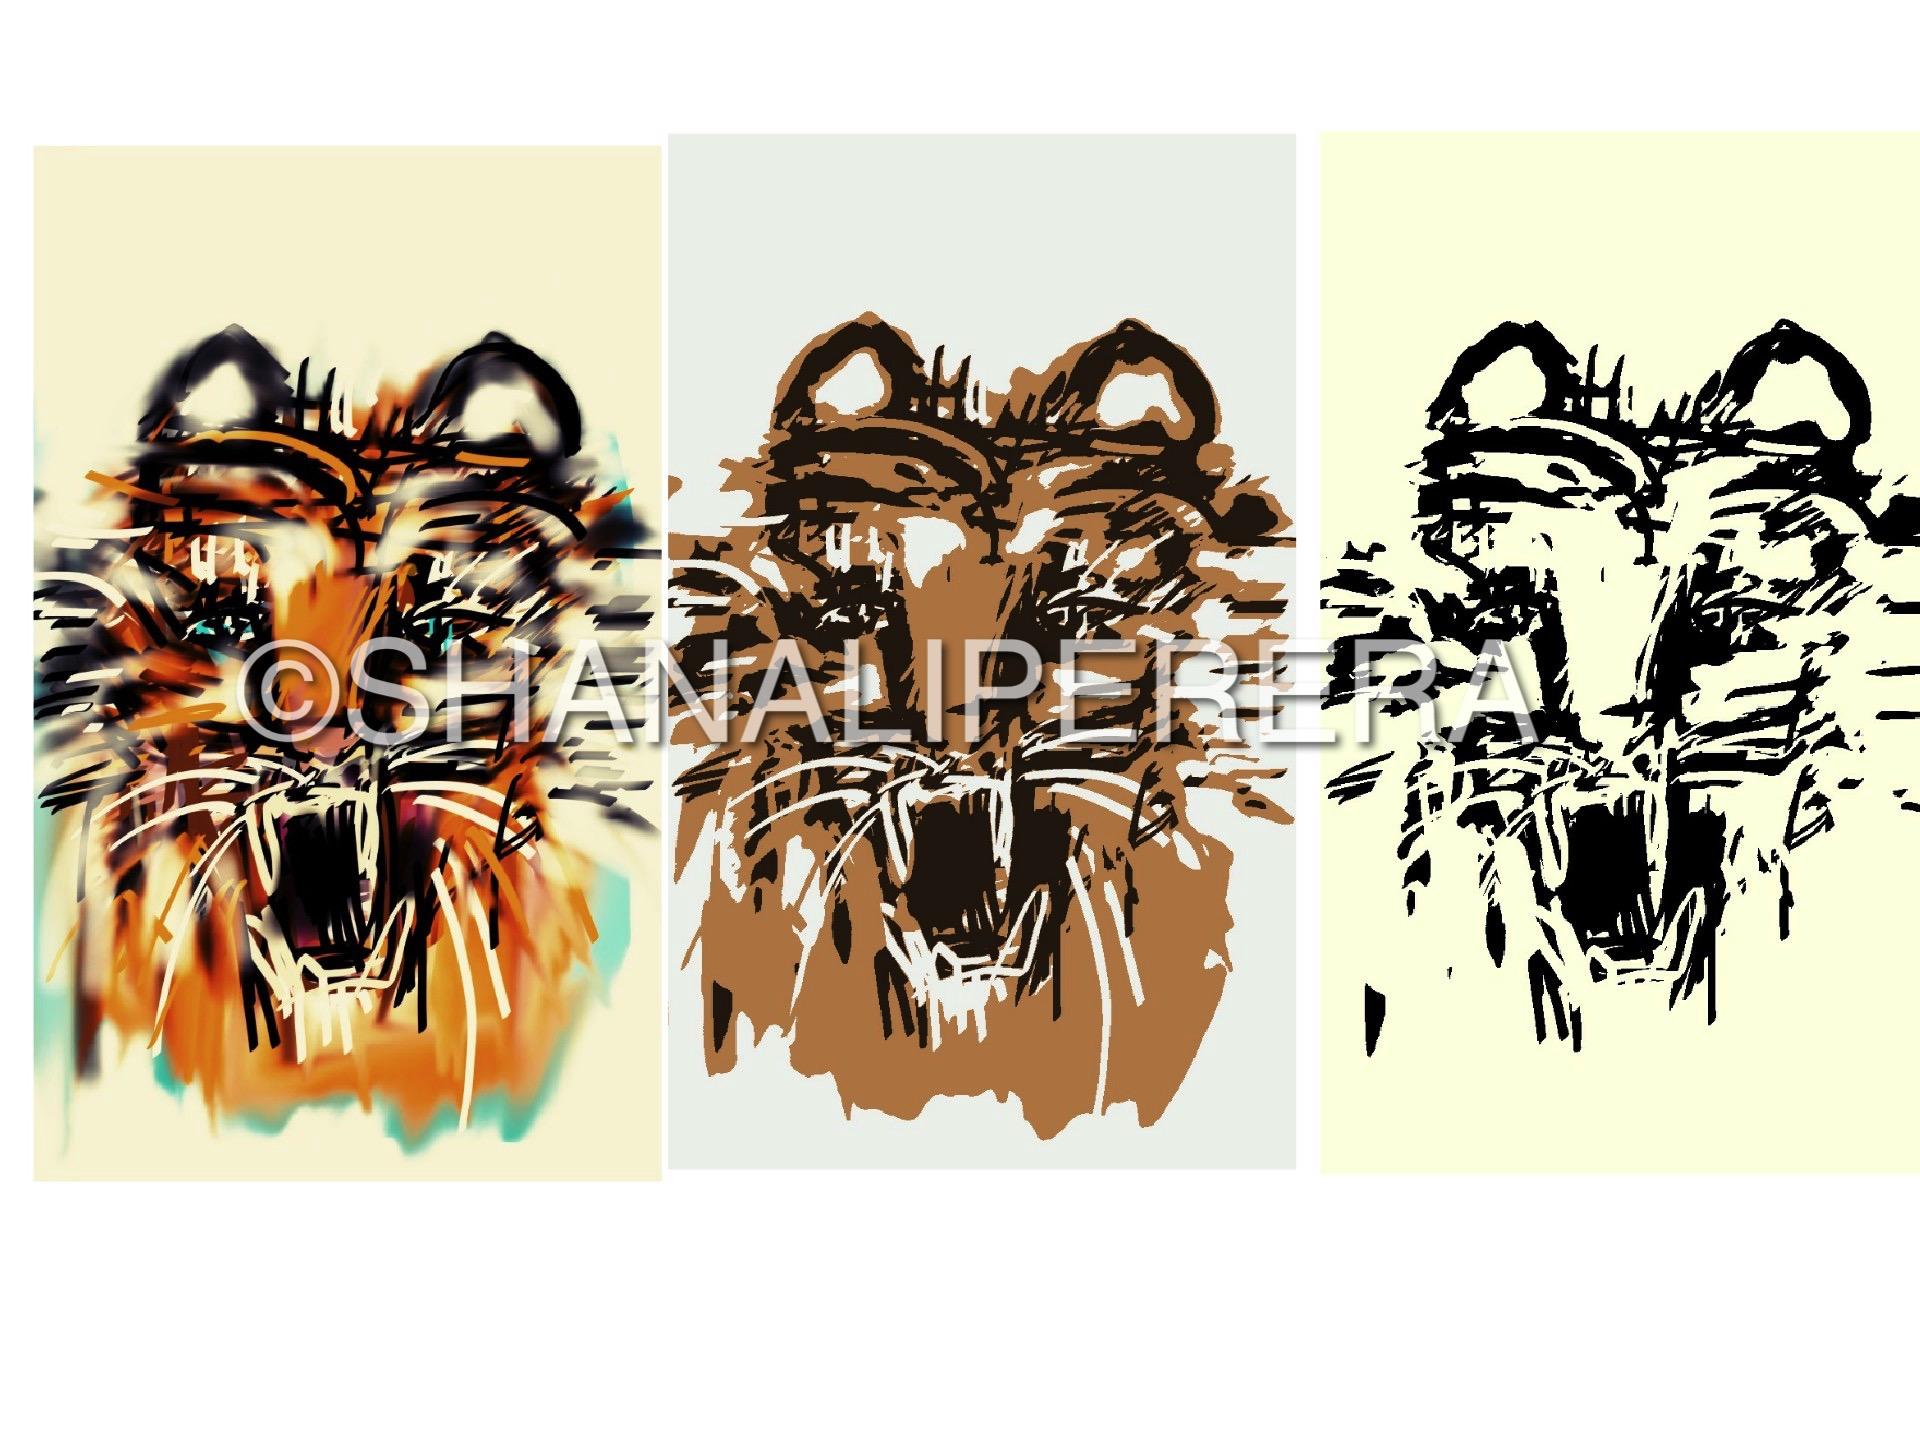 collage-1502818204602-1.jpg